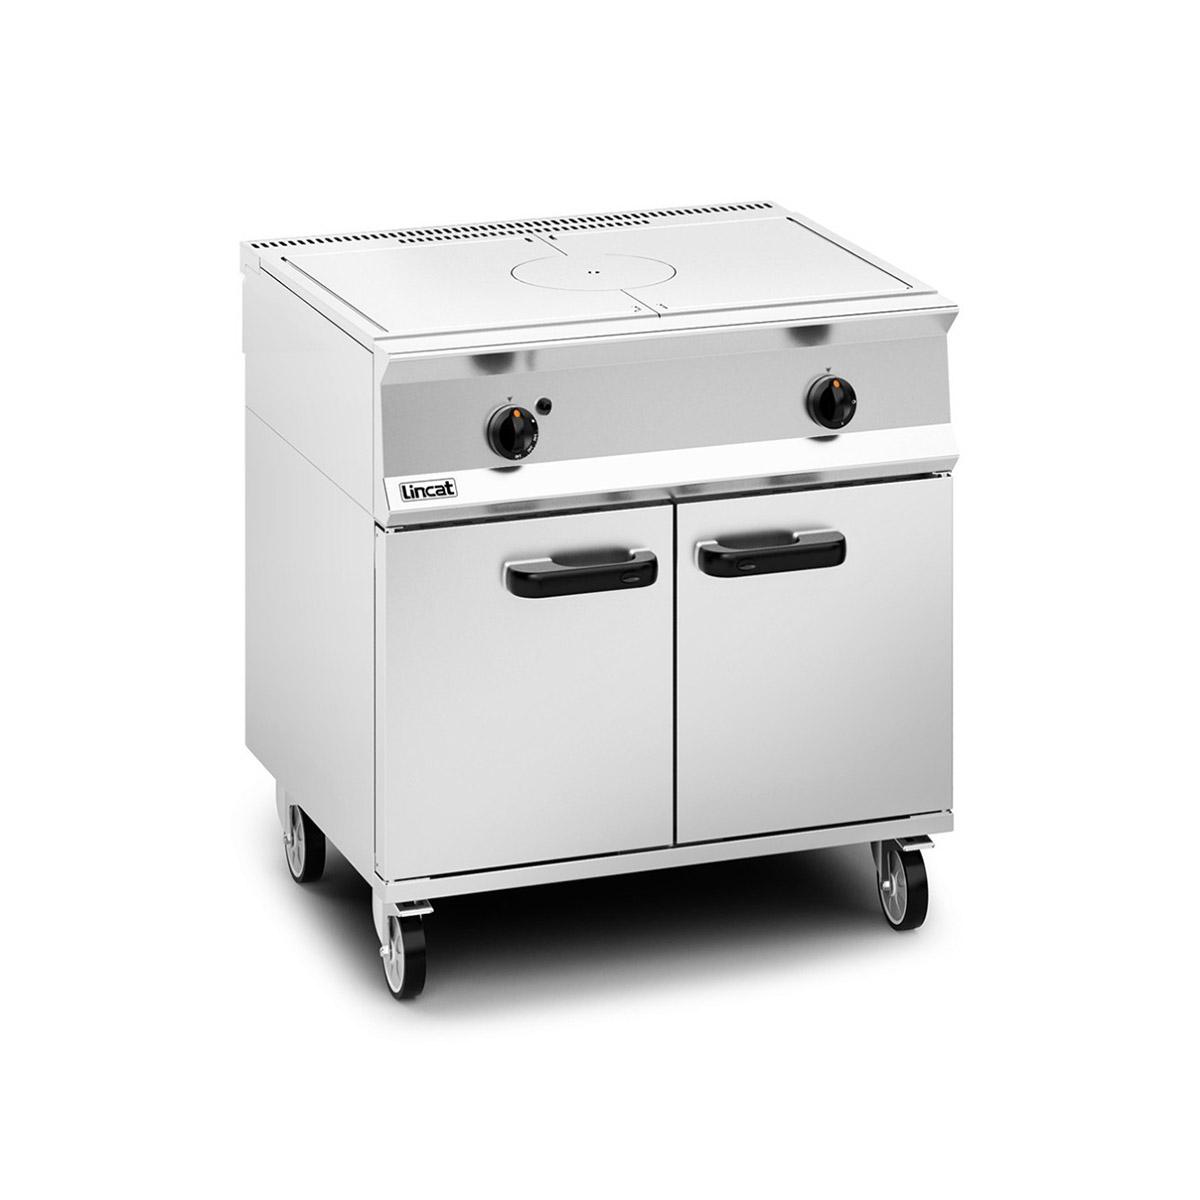 Lincat Opus 800 Solid Top Gas Oven Range Model: OG8005/P (Propane)